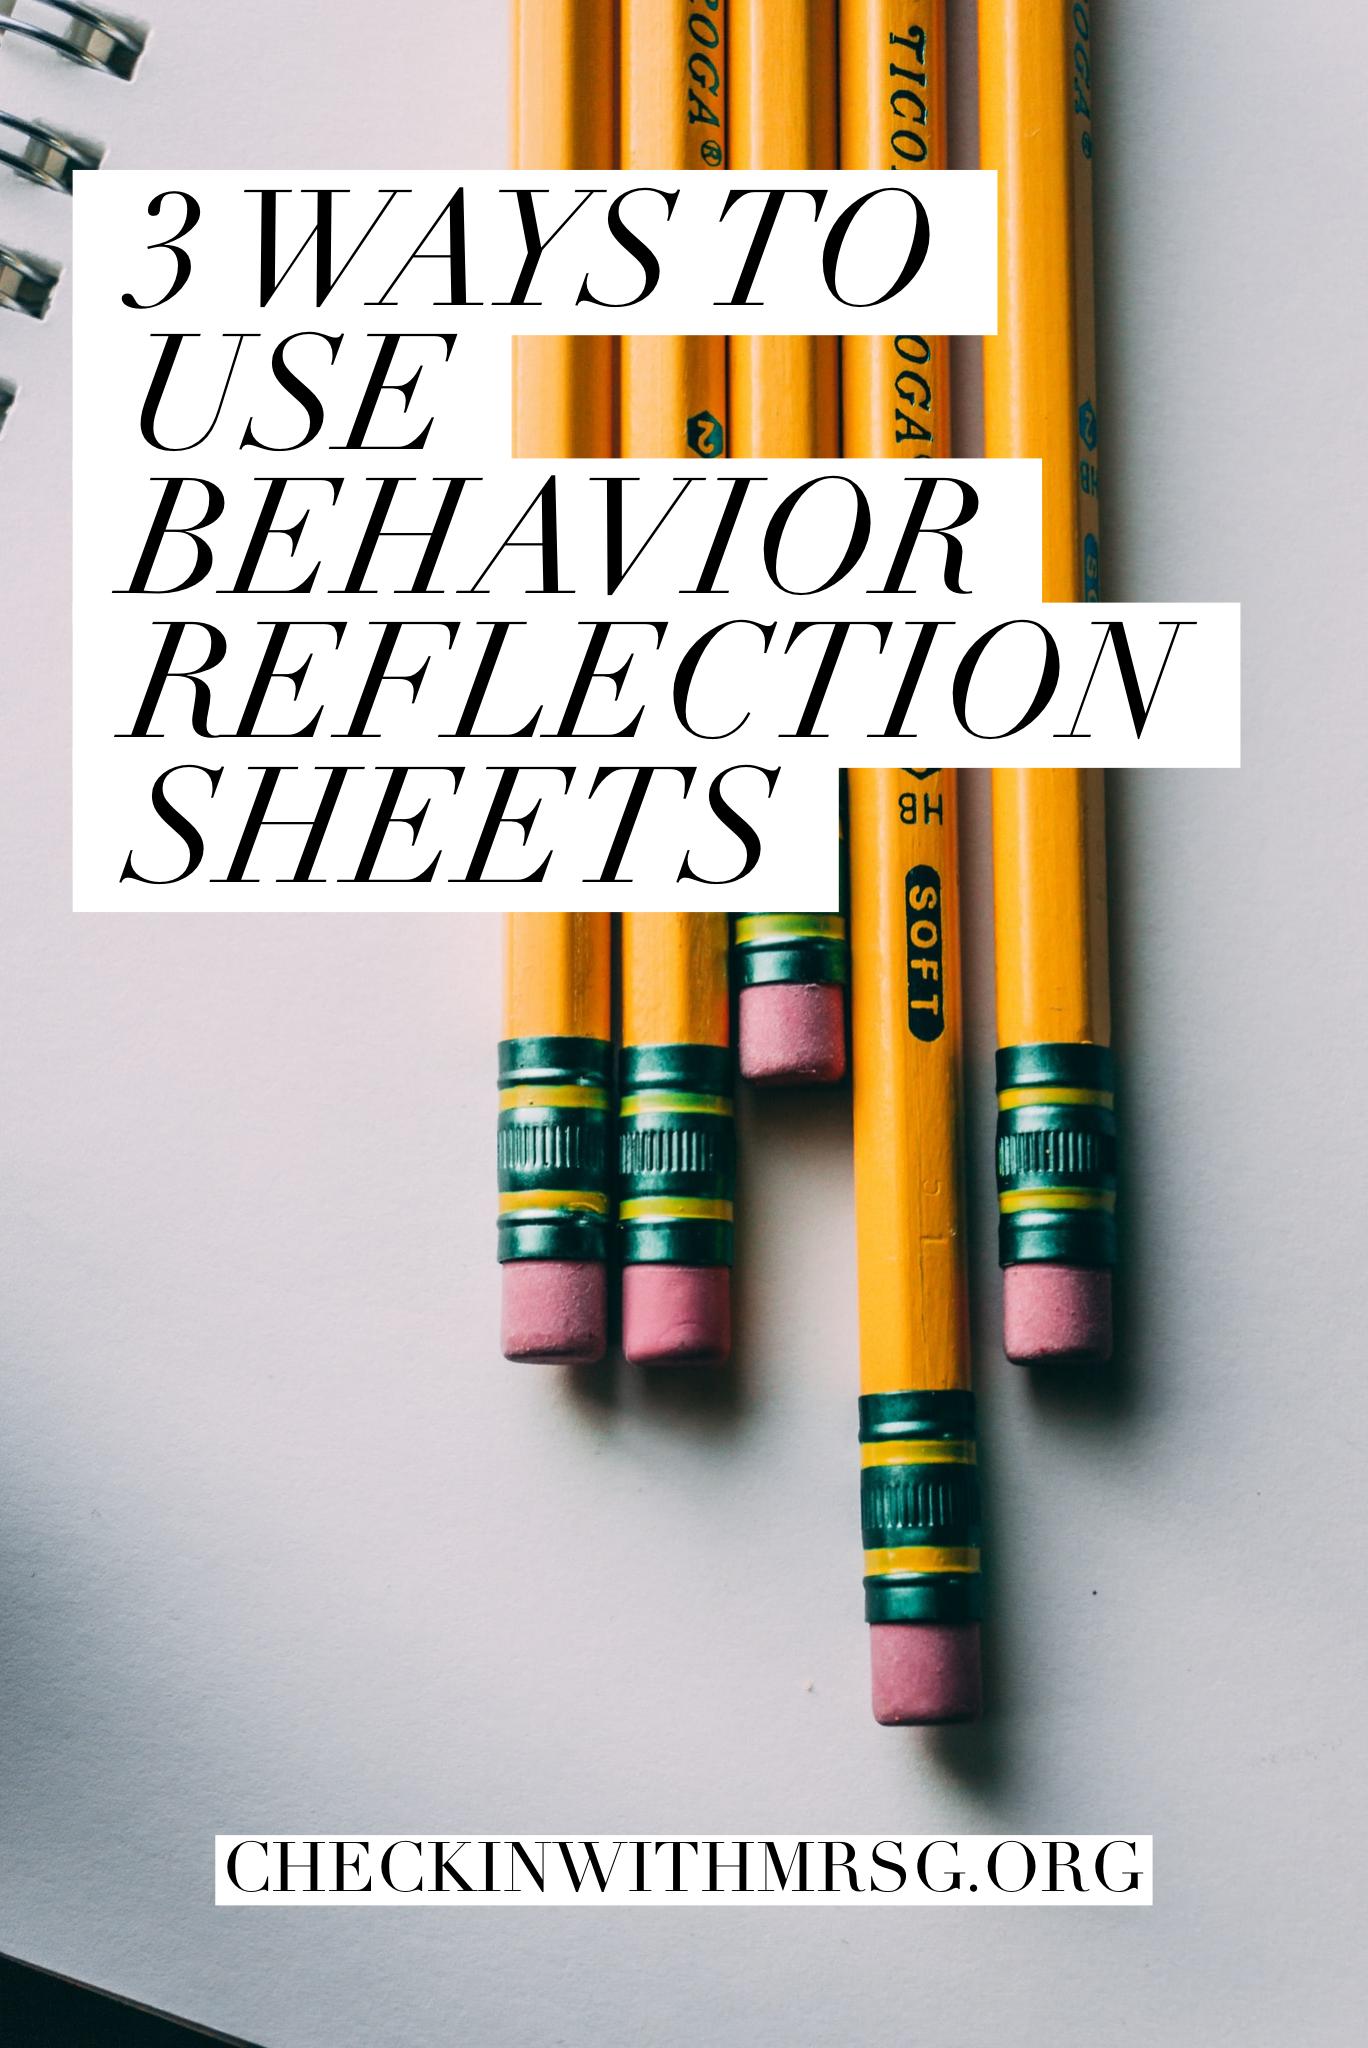 3 Ways To Use Behavior Reflection Sheets